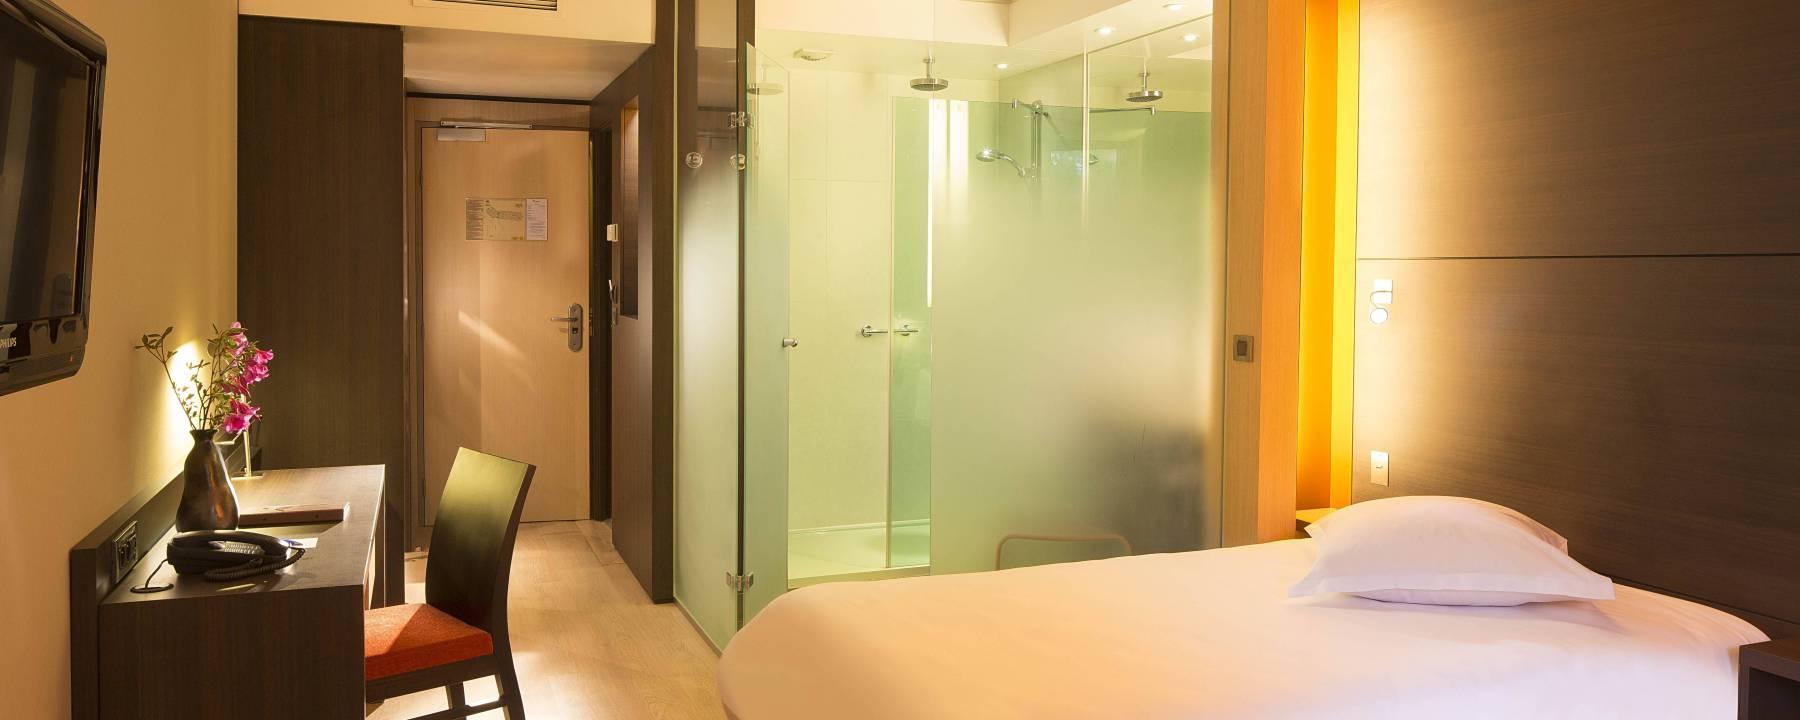 Chambre - Hotel Oceania Quimpe 4 etoiles  (1).jpg